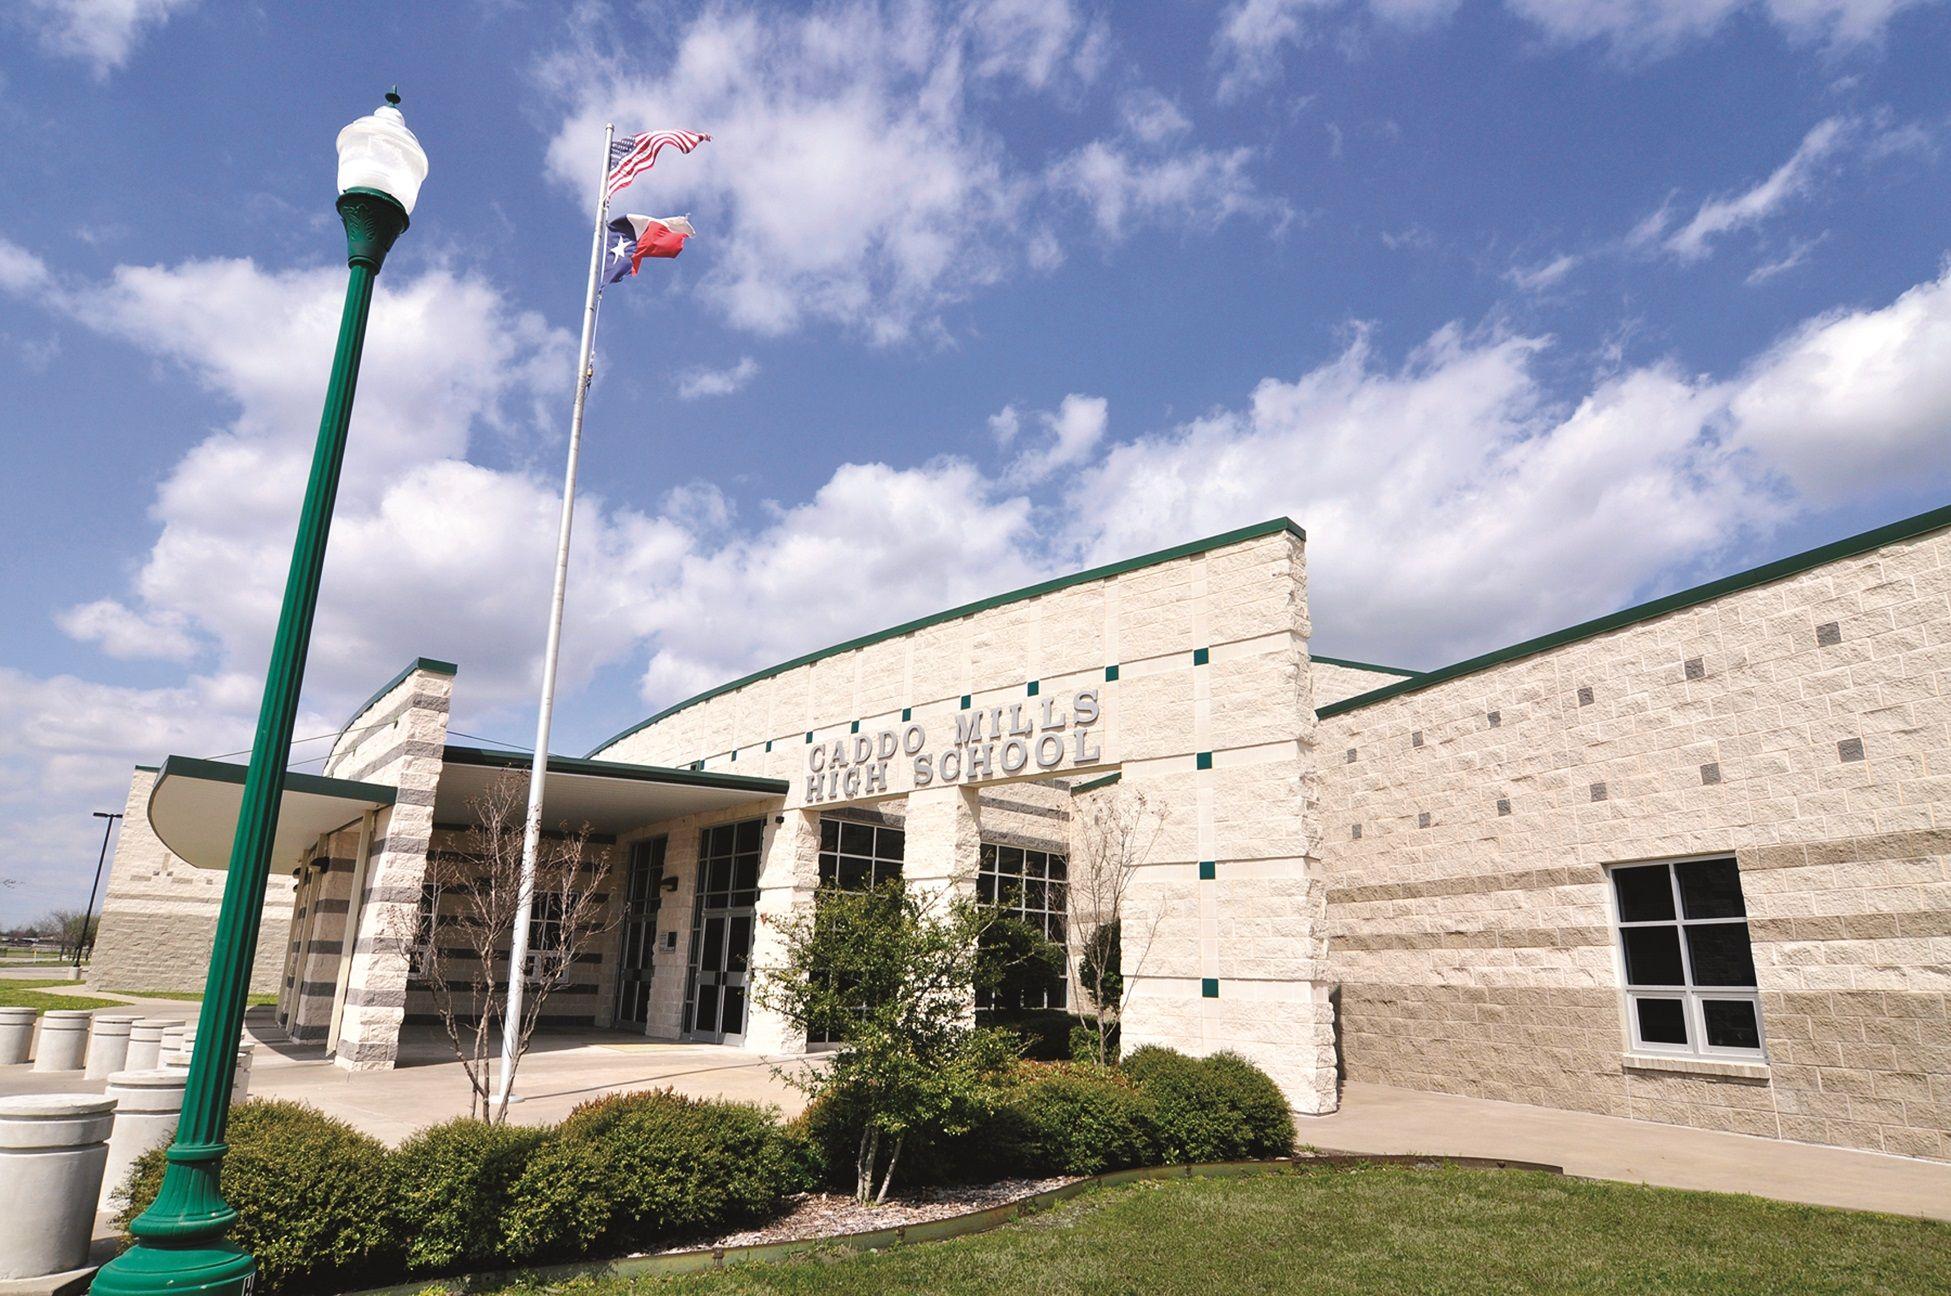 Caddo Mills High School, Caddo Mills, Texas, Split Face and